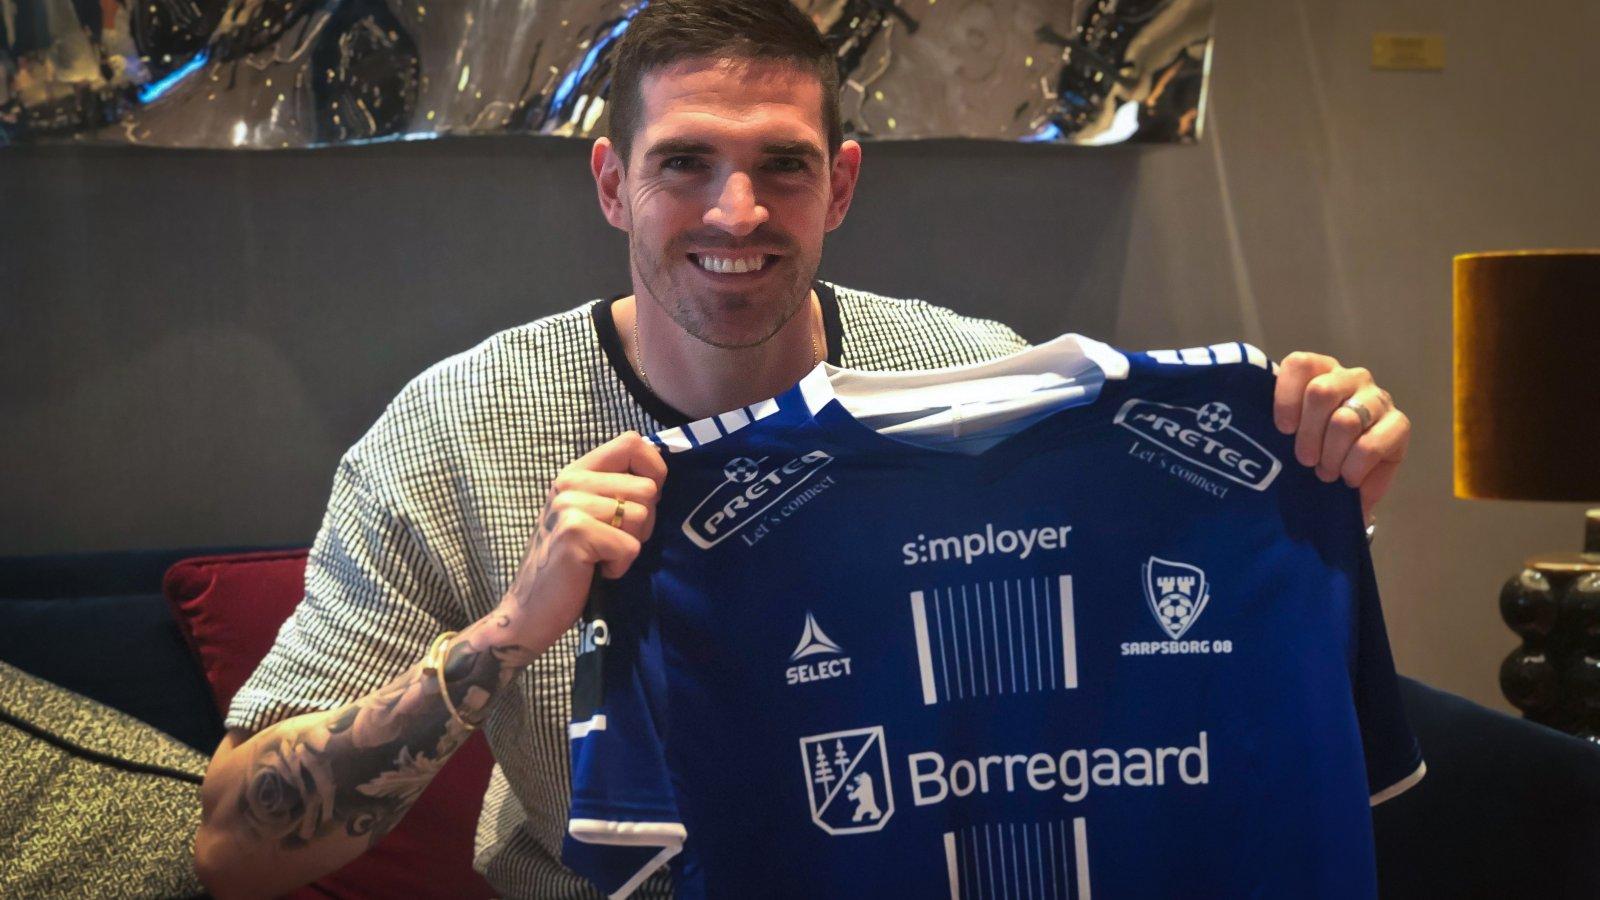 Former Rangers striker Kyle Lafferty shares bonus with Sarpsborg team-mates